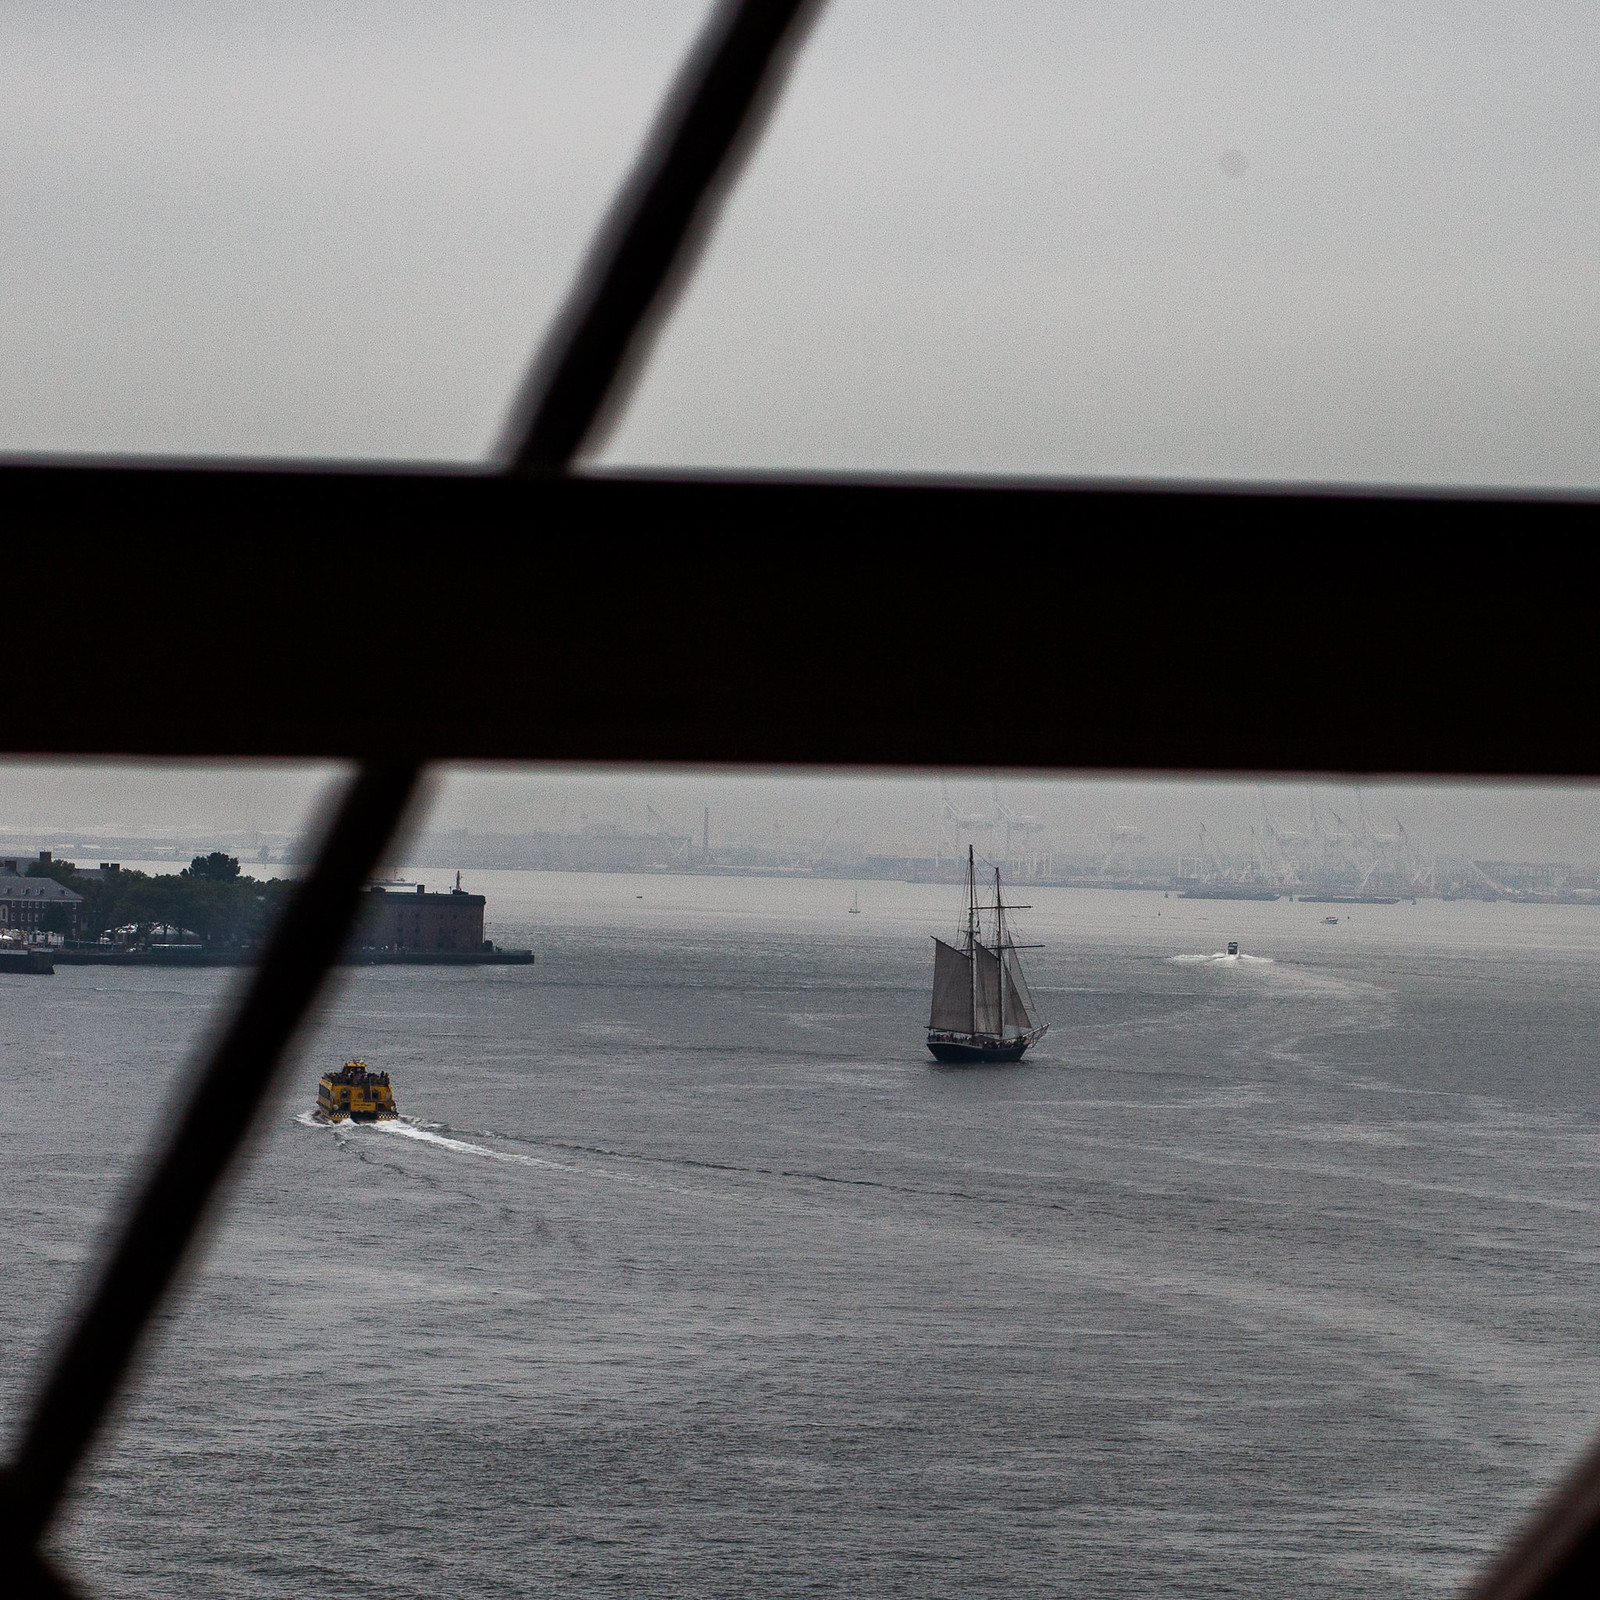 Tall Ship by wwward0